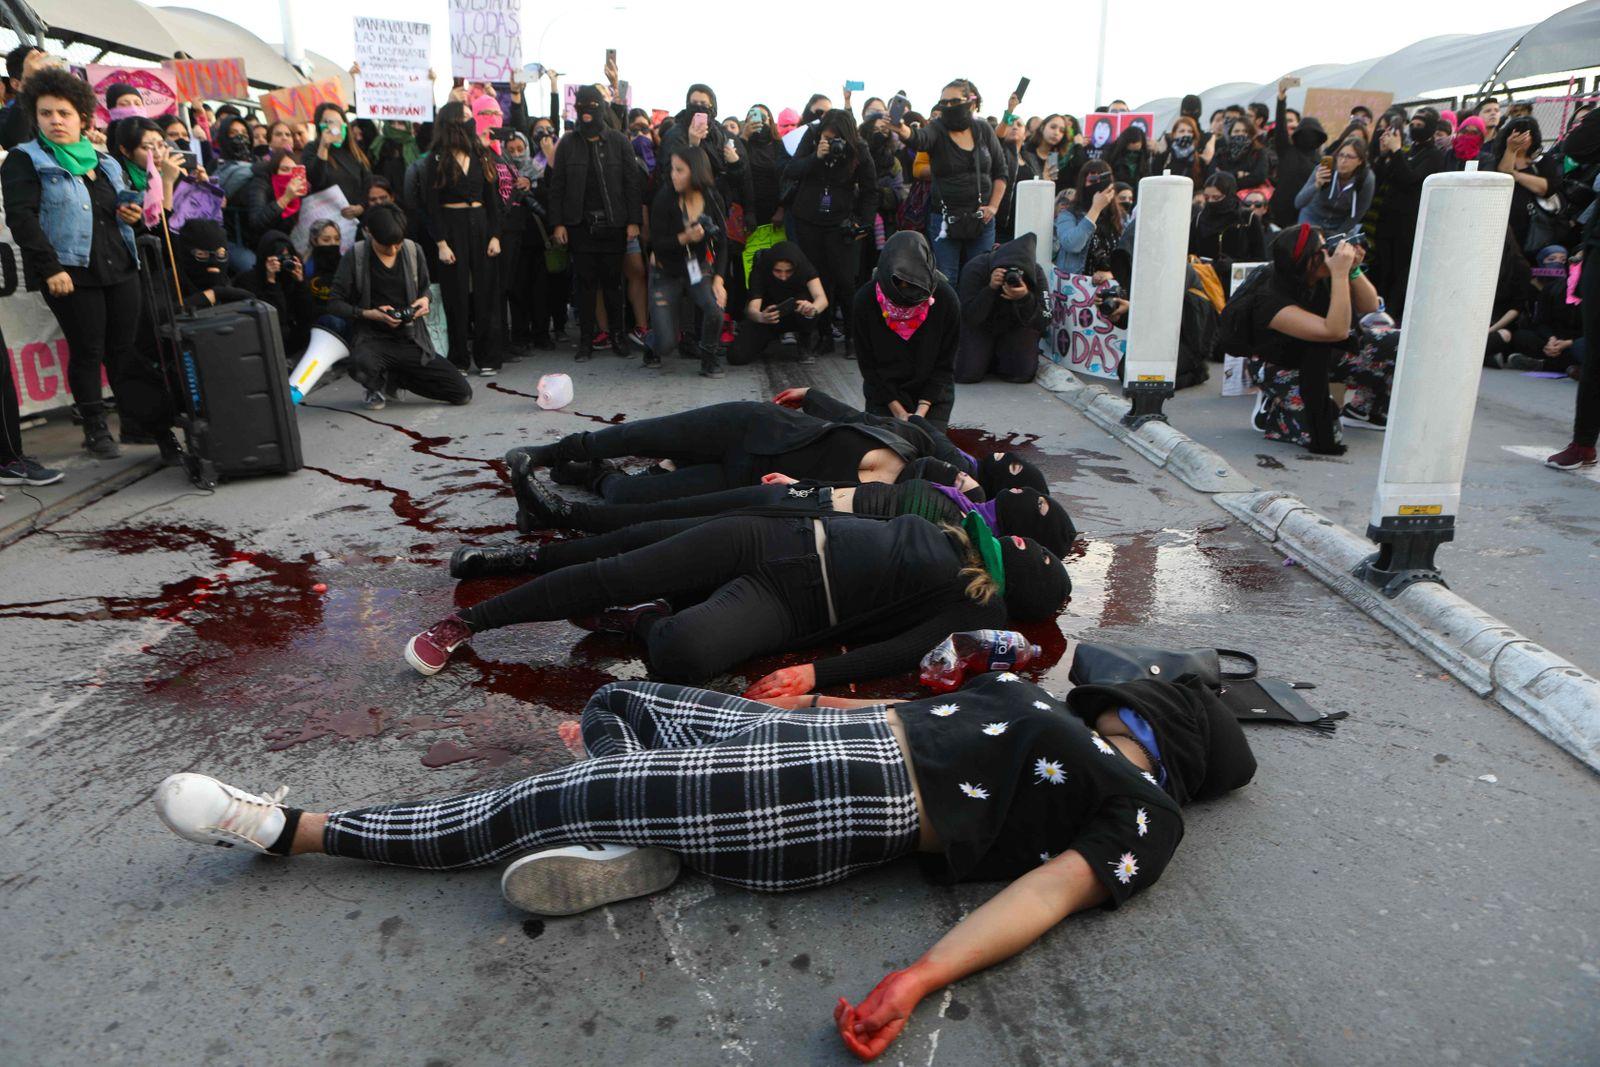 MEXICO-CRIME-VIOLENCE-WOMEN-PROTEST